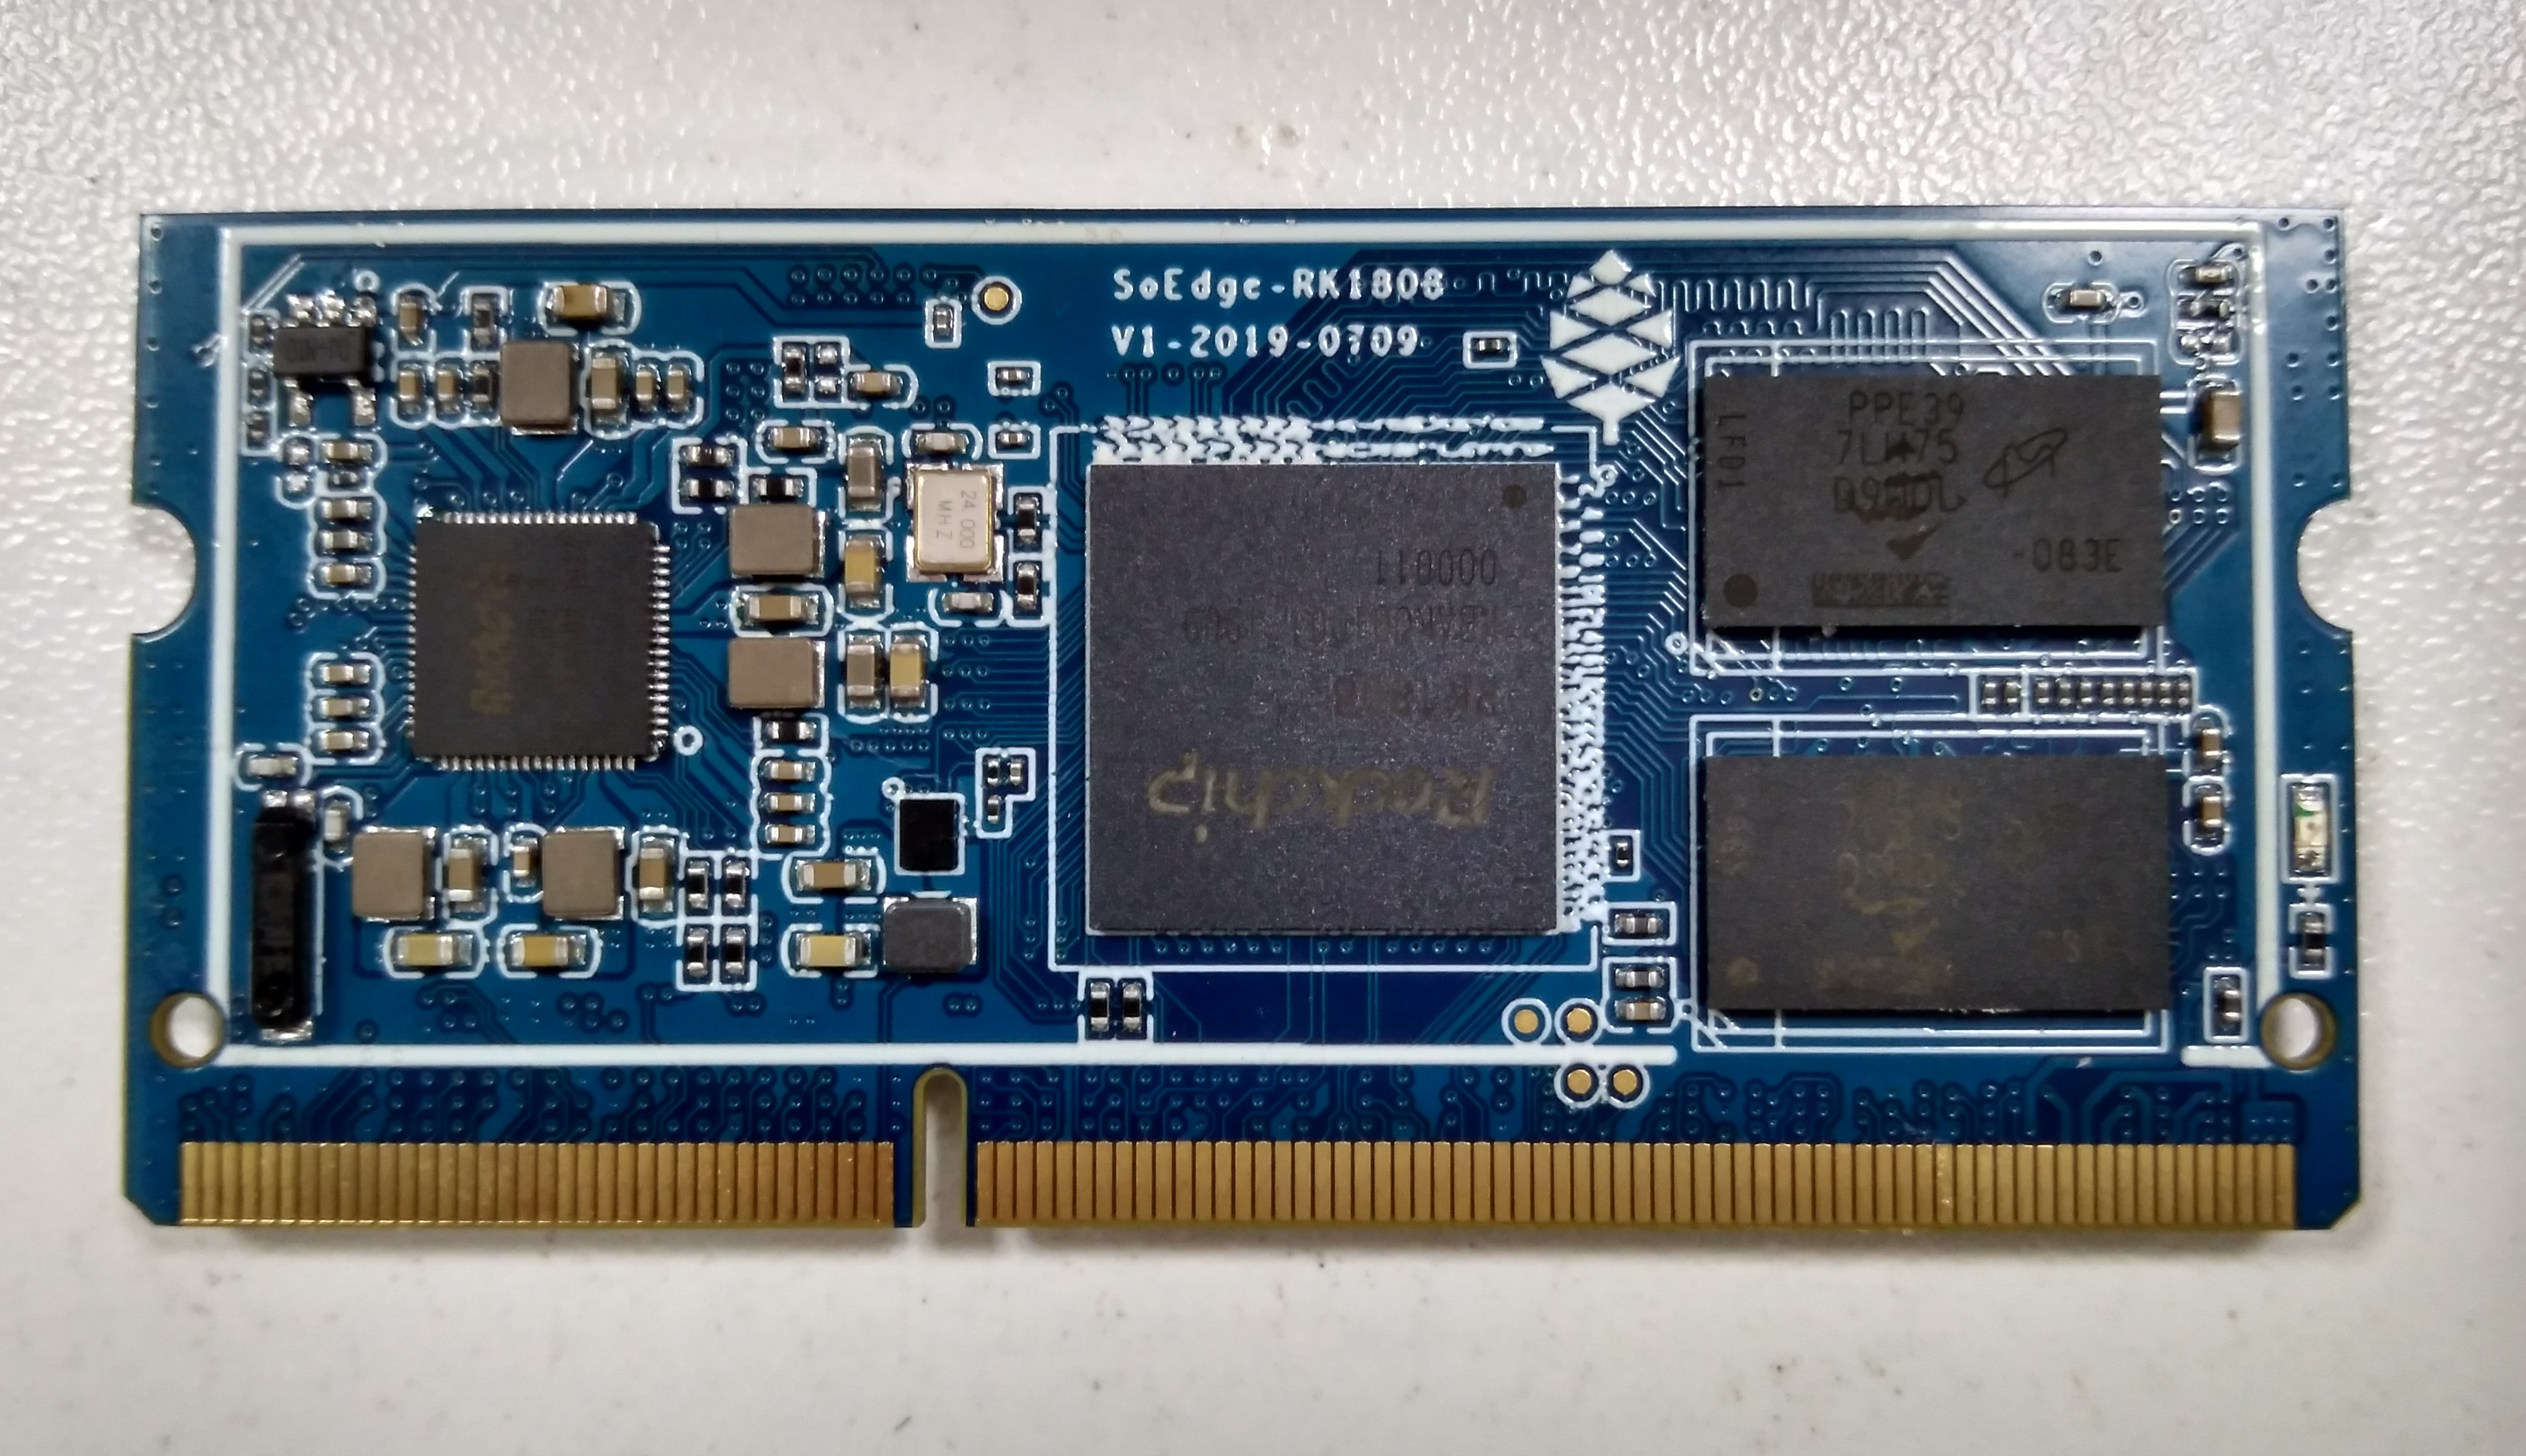 Pine64's SoEdge-RK1808 AI Module Delivers 3.0 TOPS using Rockchip RK1808 SoC